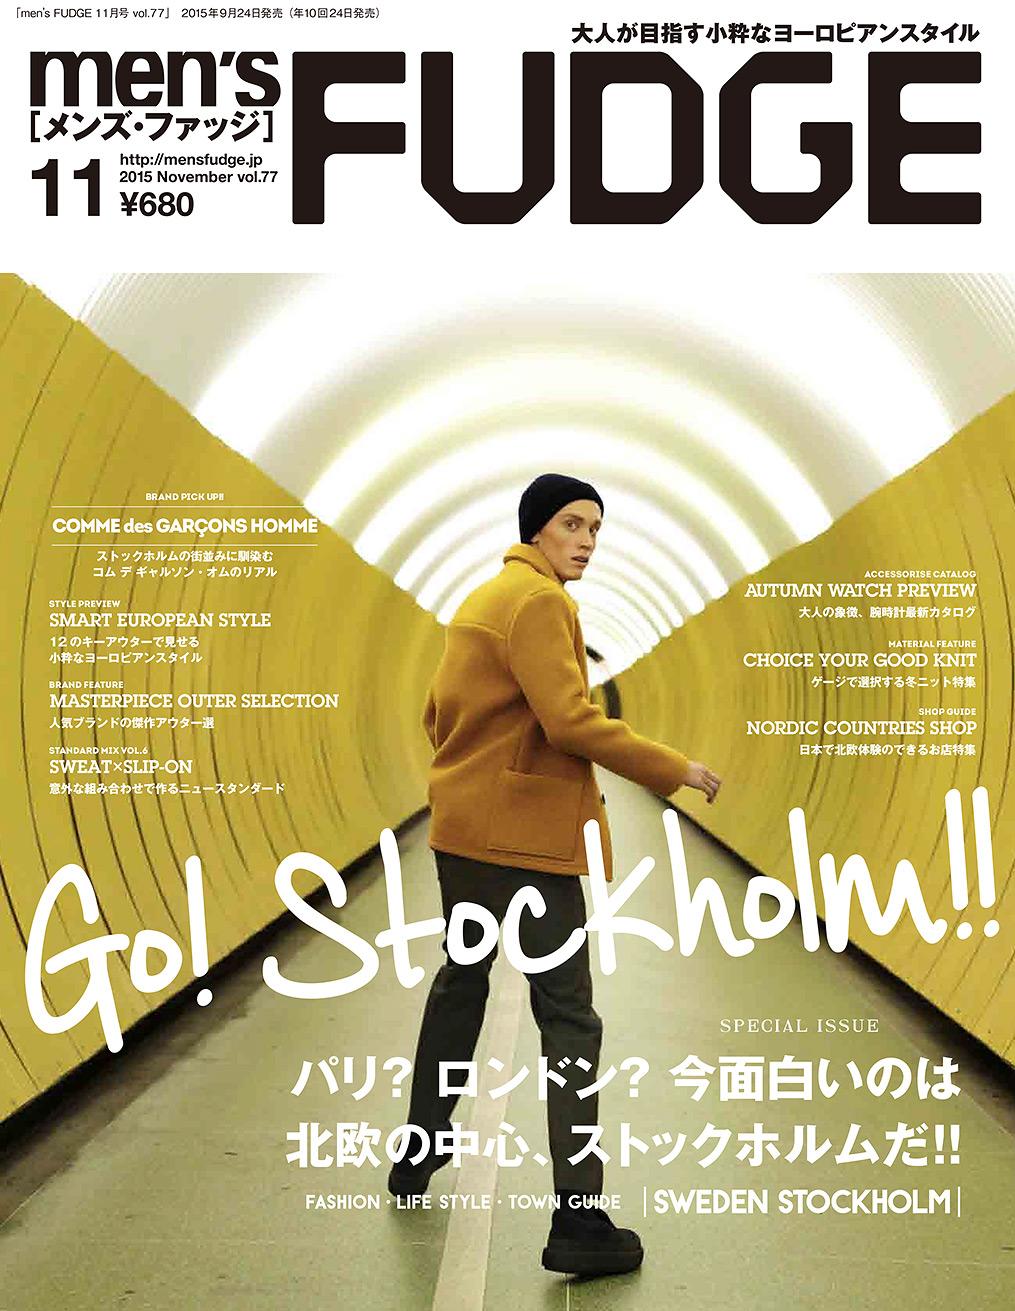 mensfudge2015_11_77-